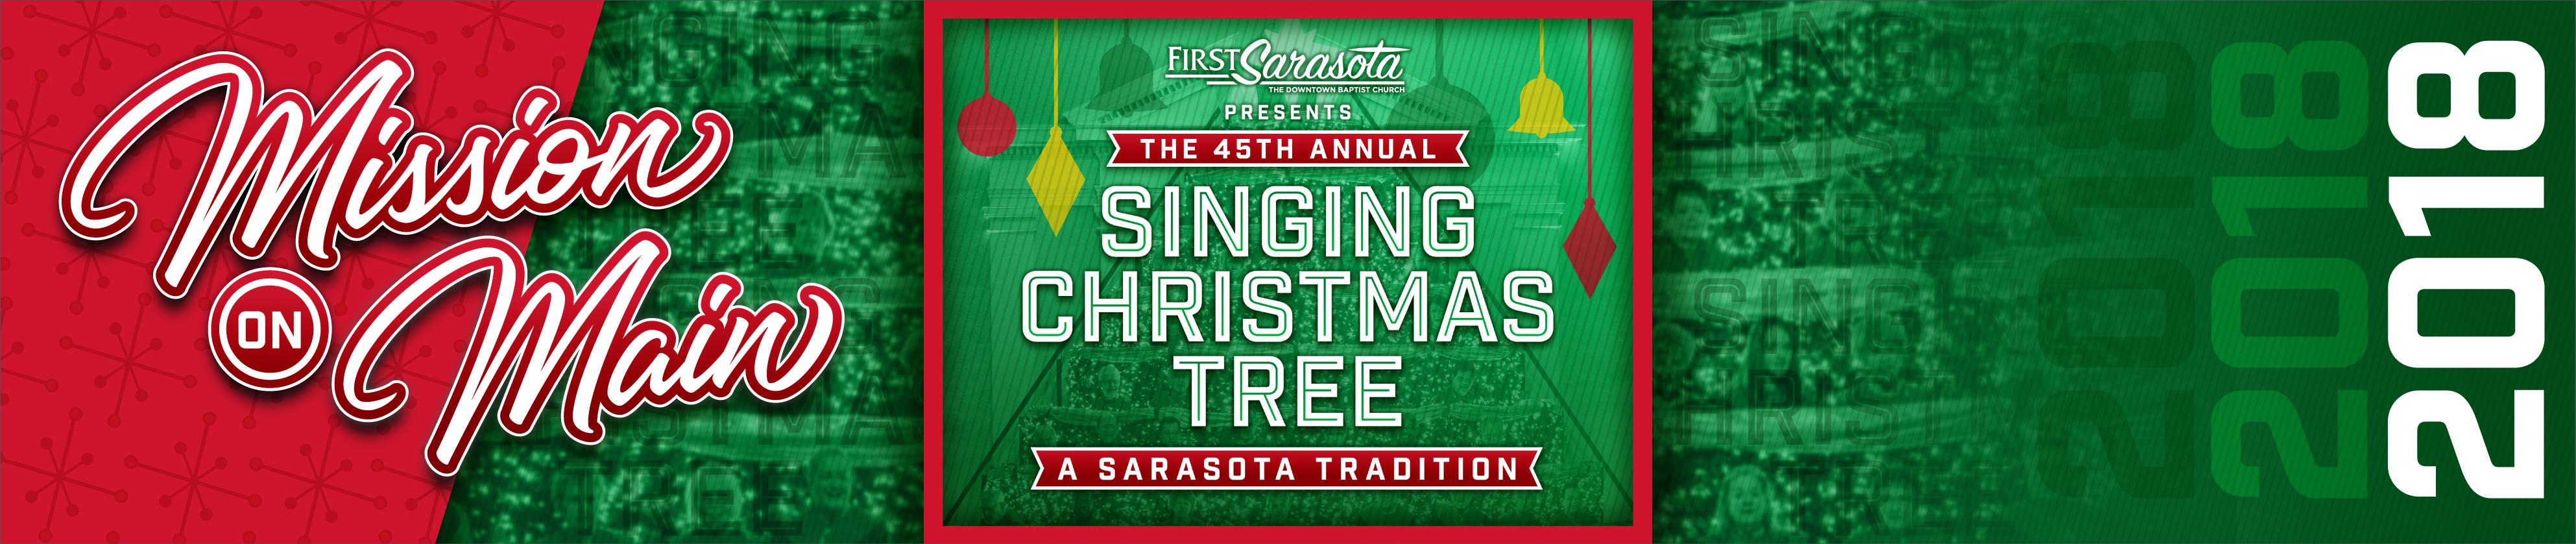 Singing Christmas Tree - First Sarasota   Brushfire